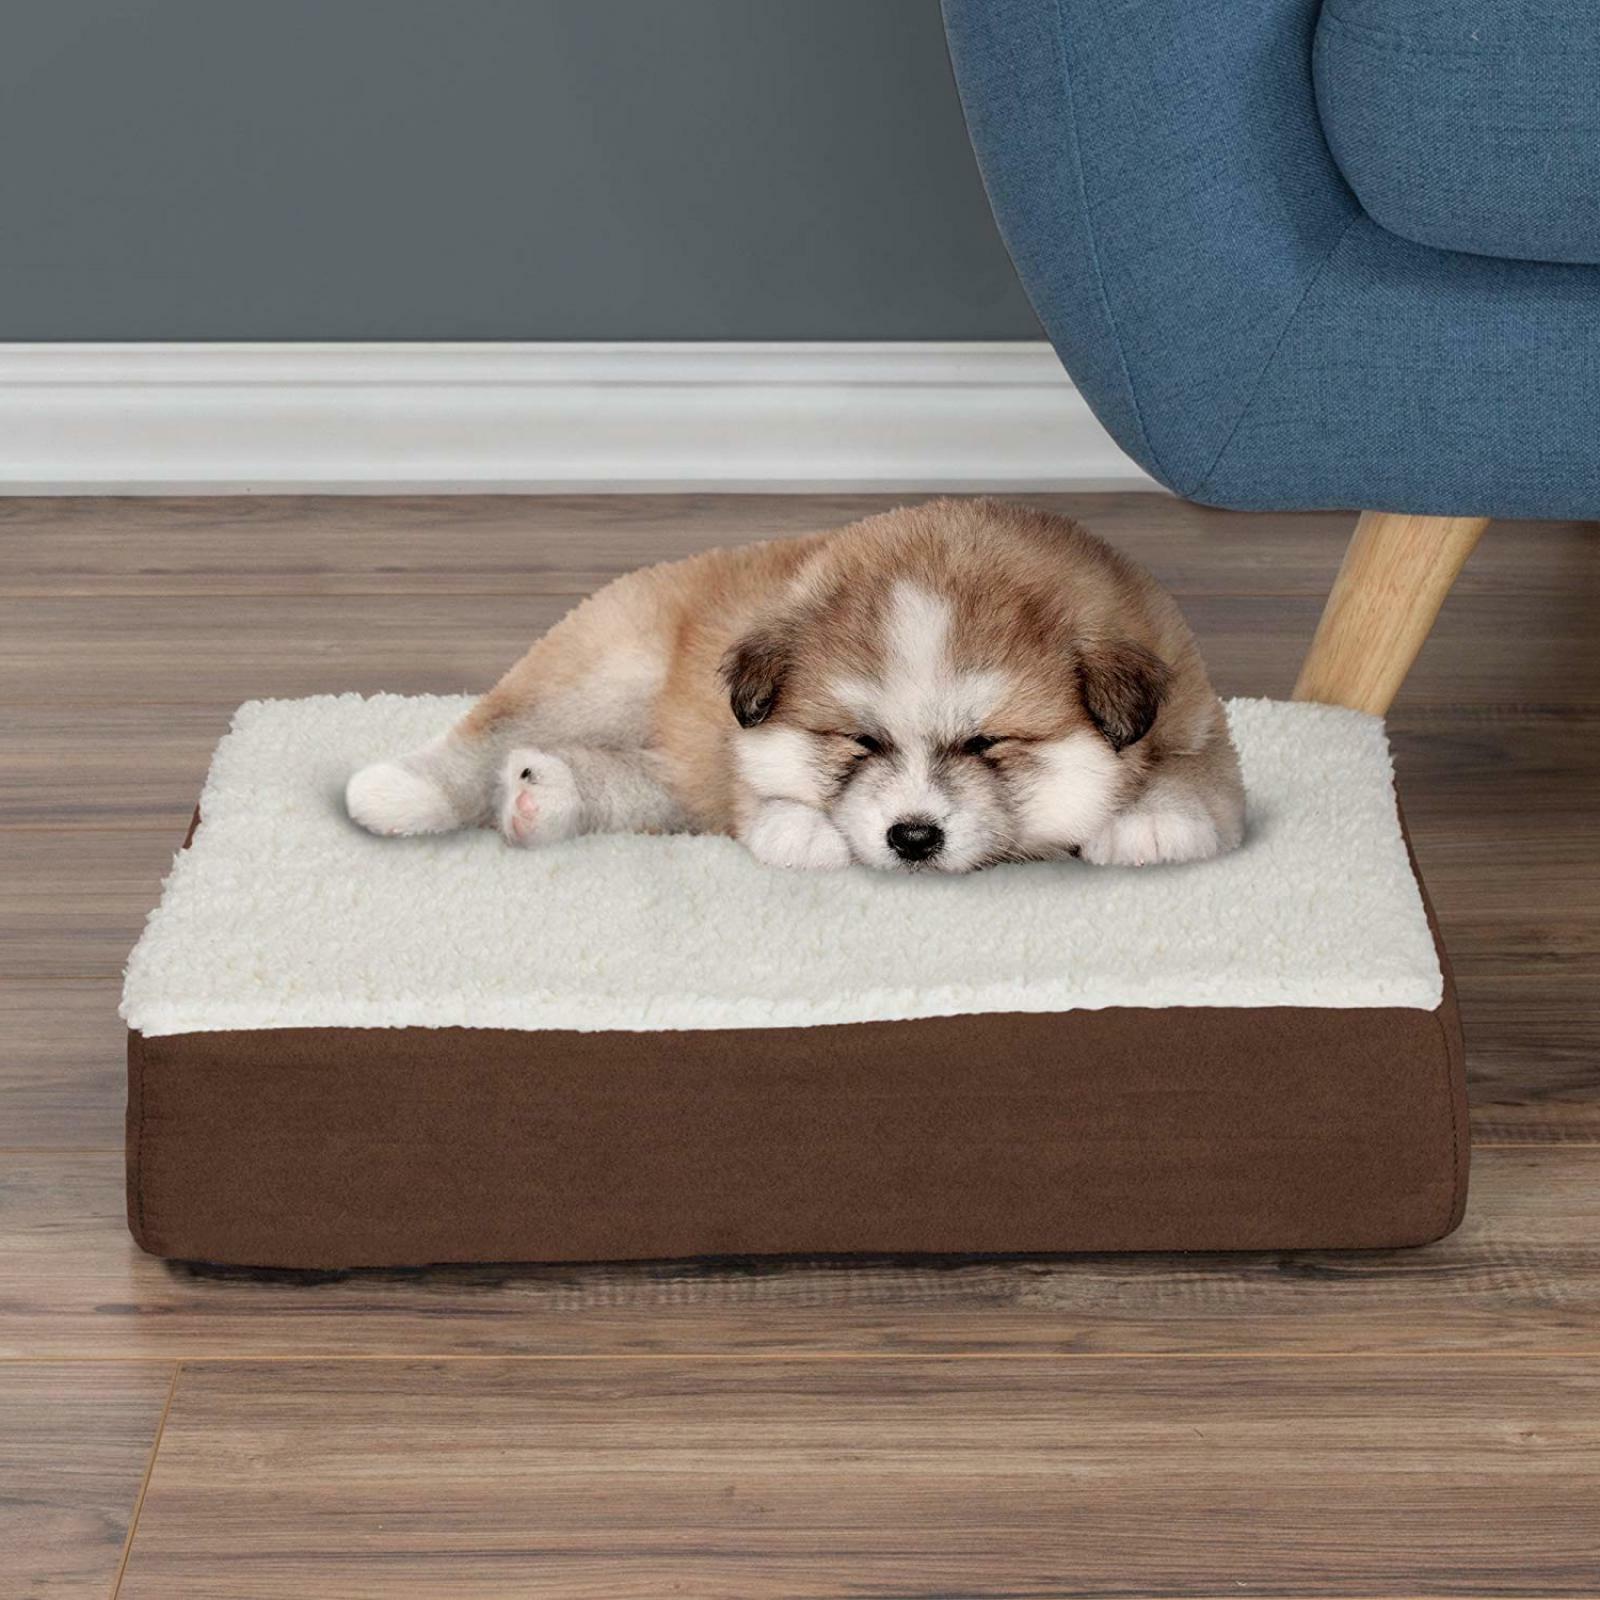 Orthopedic Foam Cover Top Pet Small